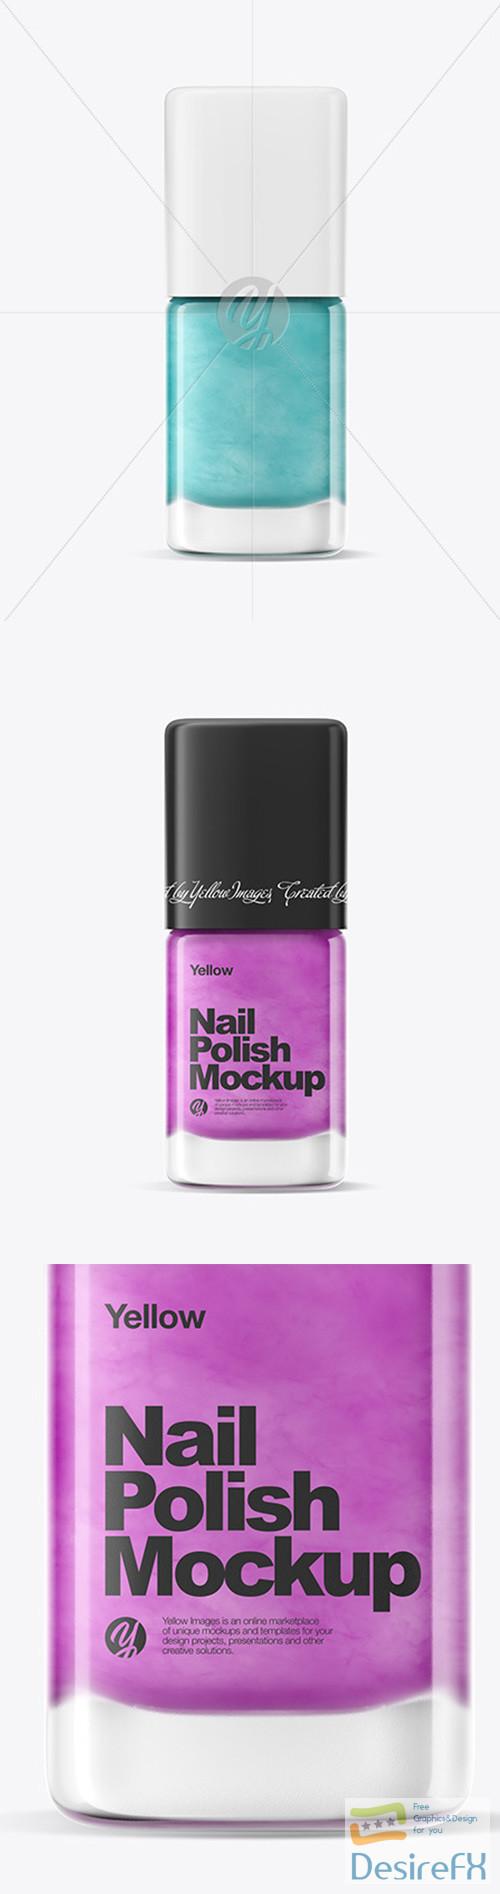 mock-up - Nail Polish Mockup w/ Matte Cap 52104 TIF